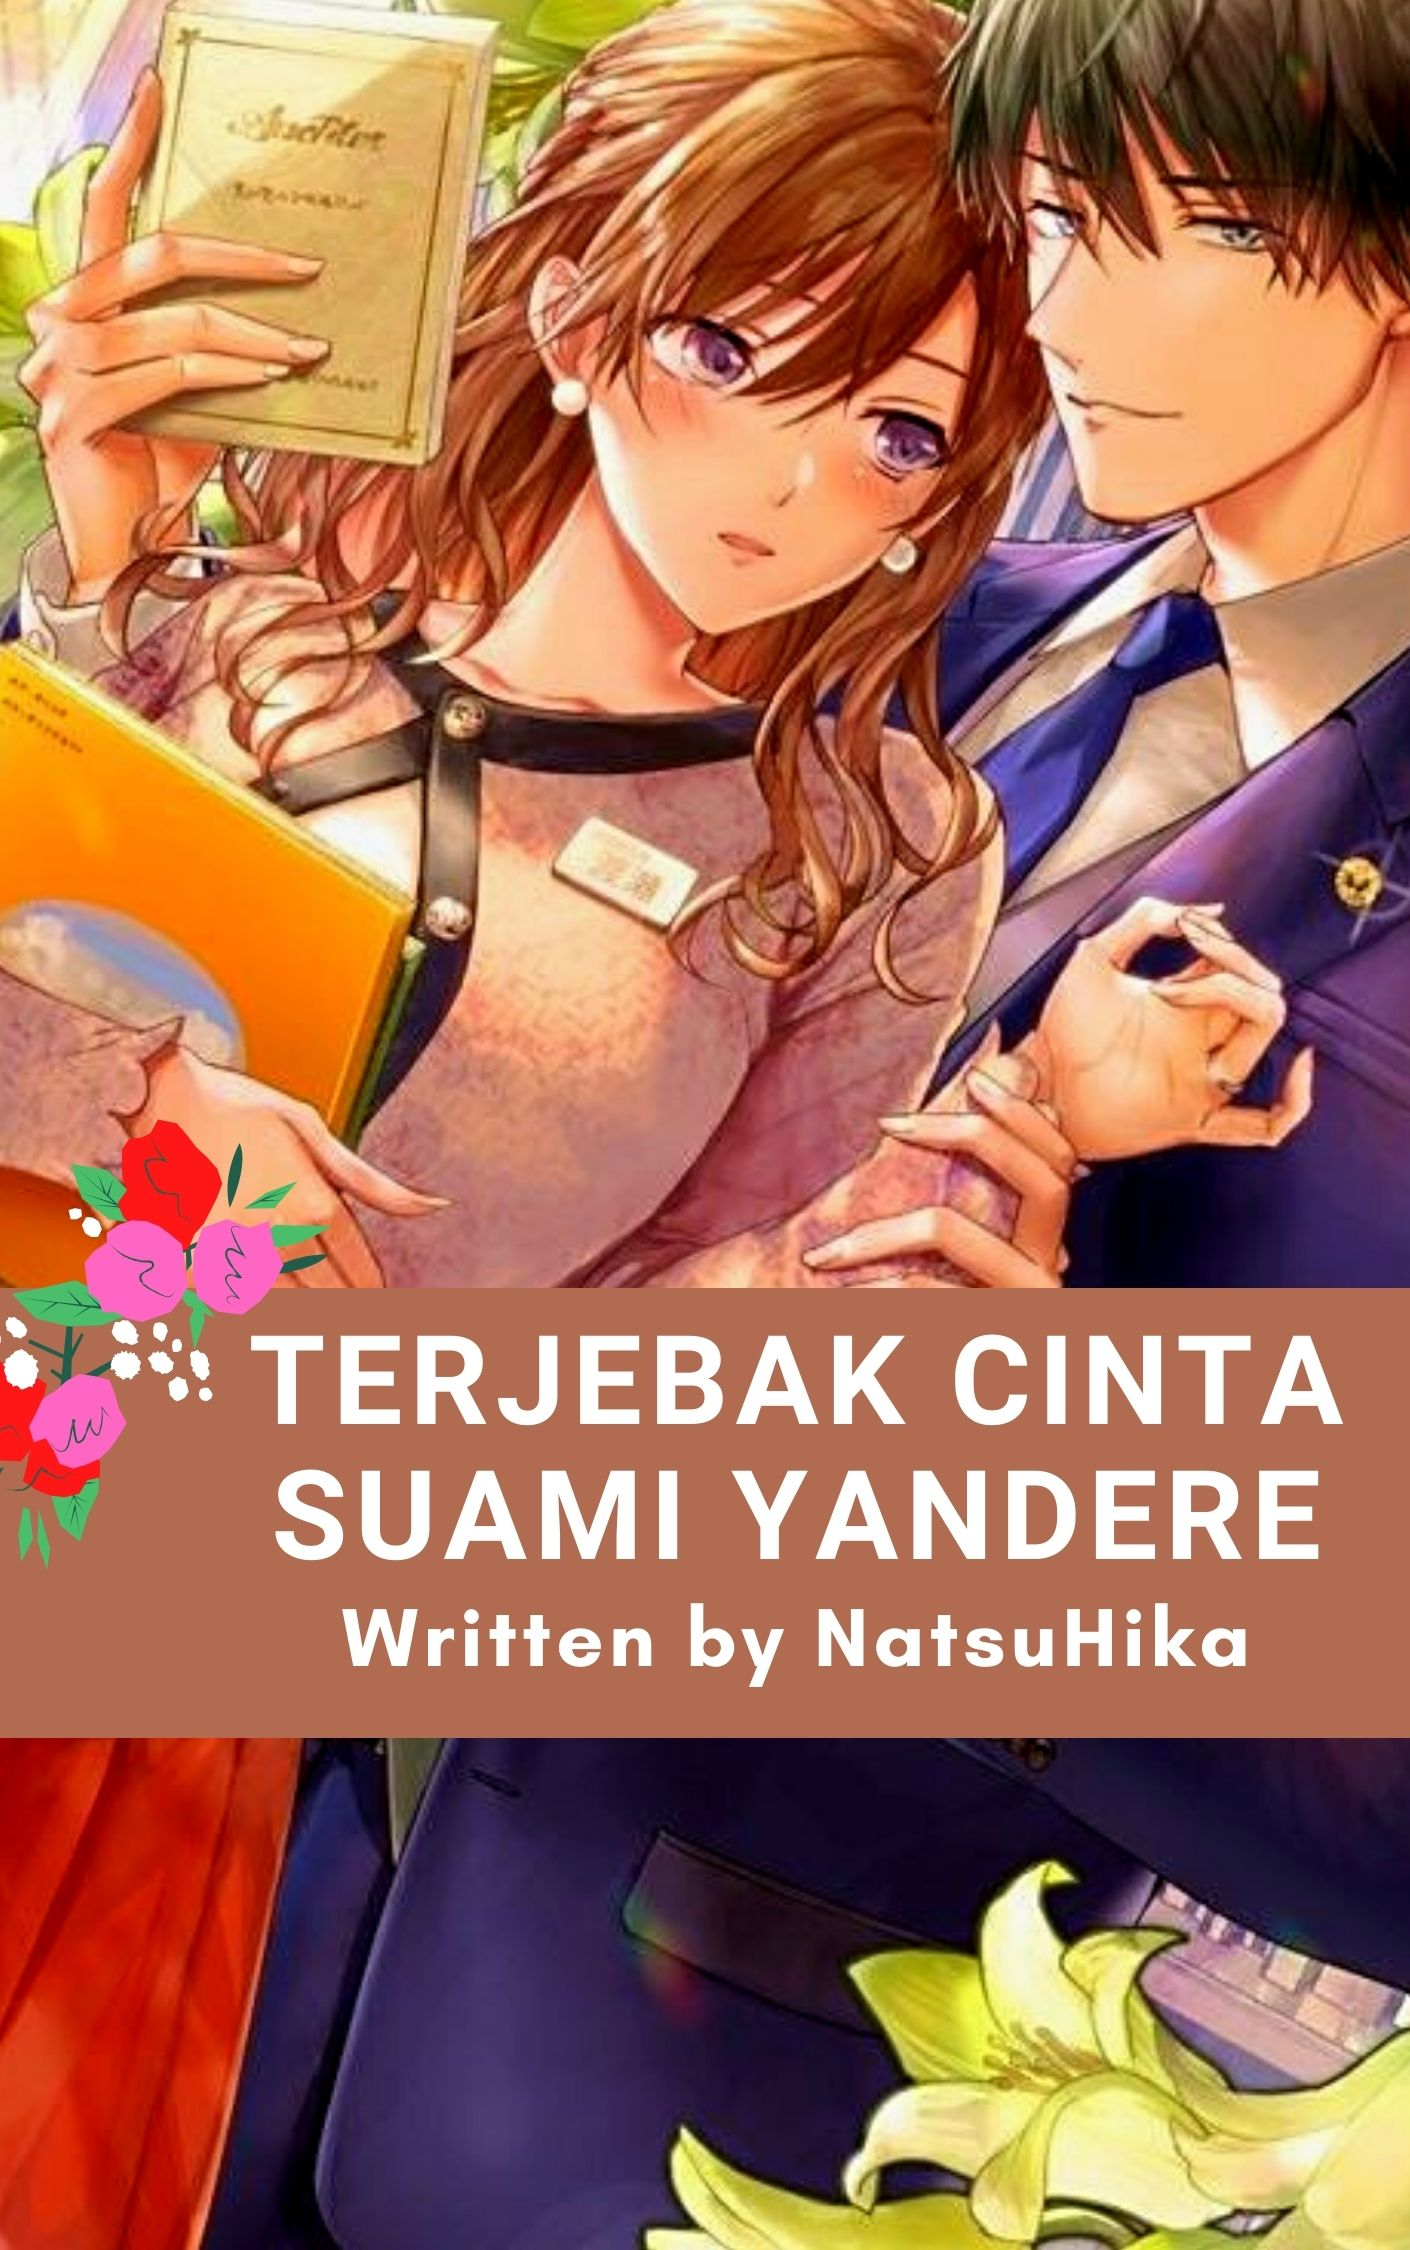 Terjebak Cinta Suami Yandere (Indonesia)